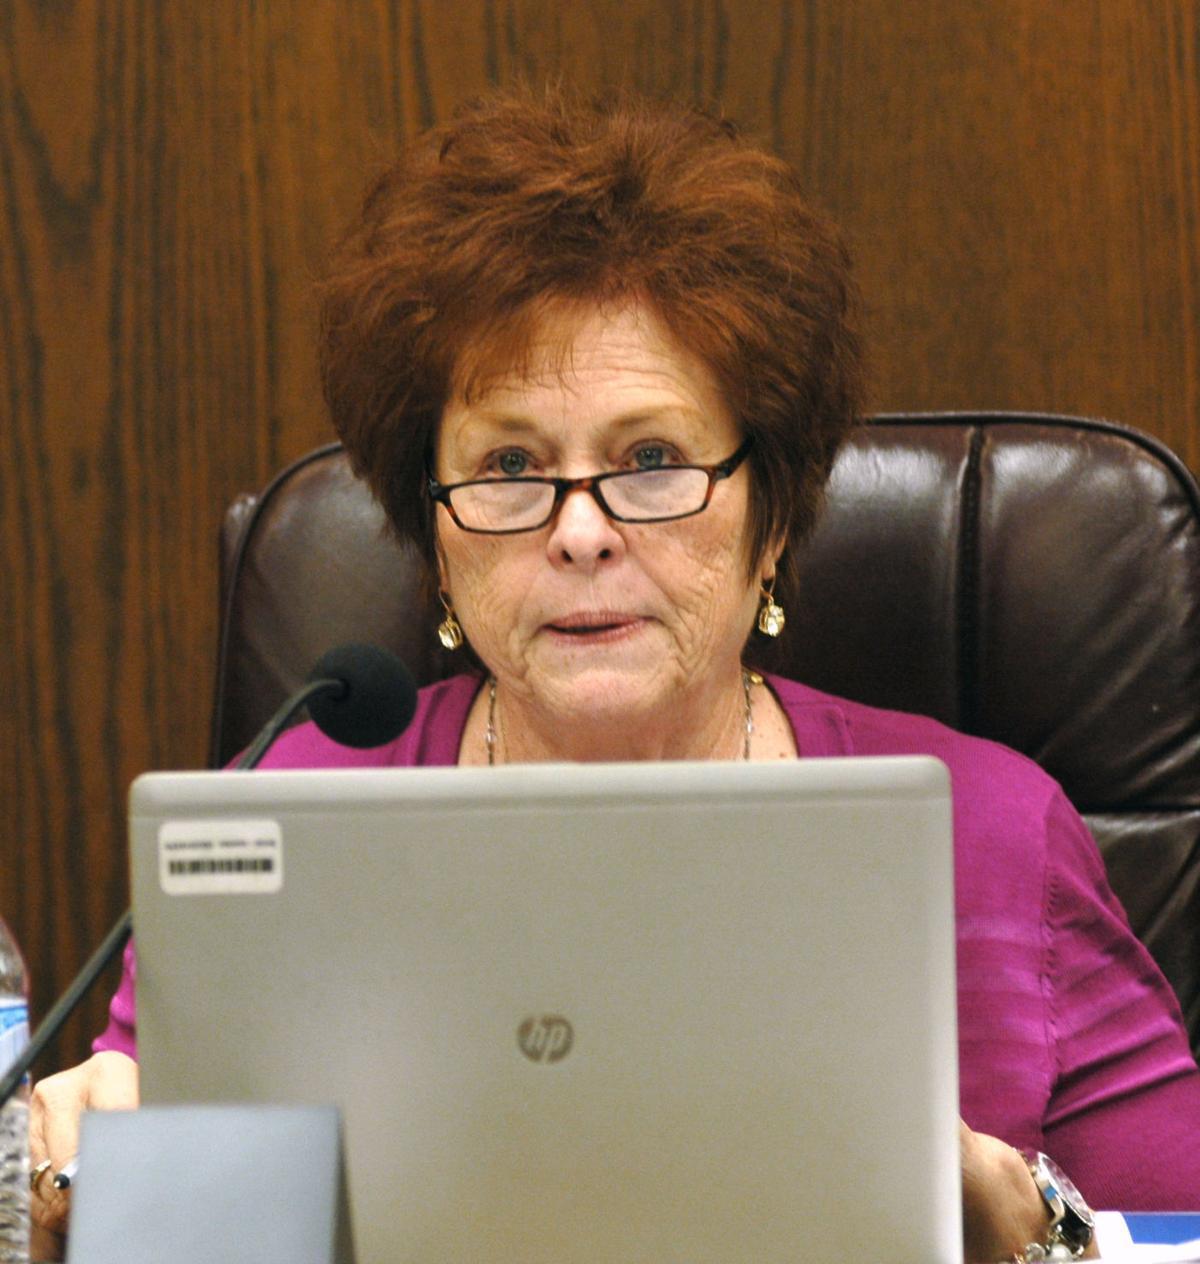 State Sen. Sylvia Allen